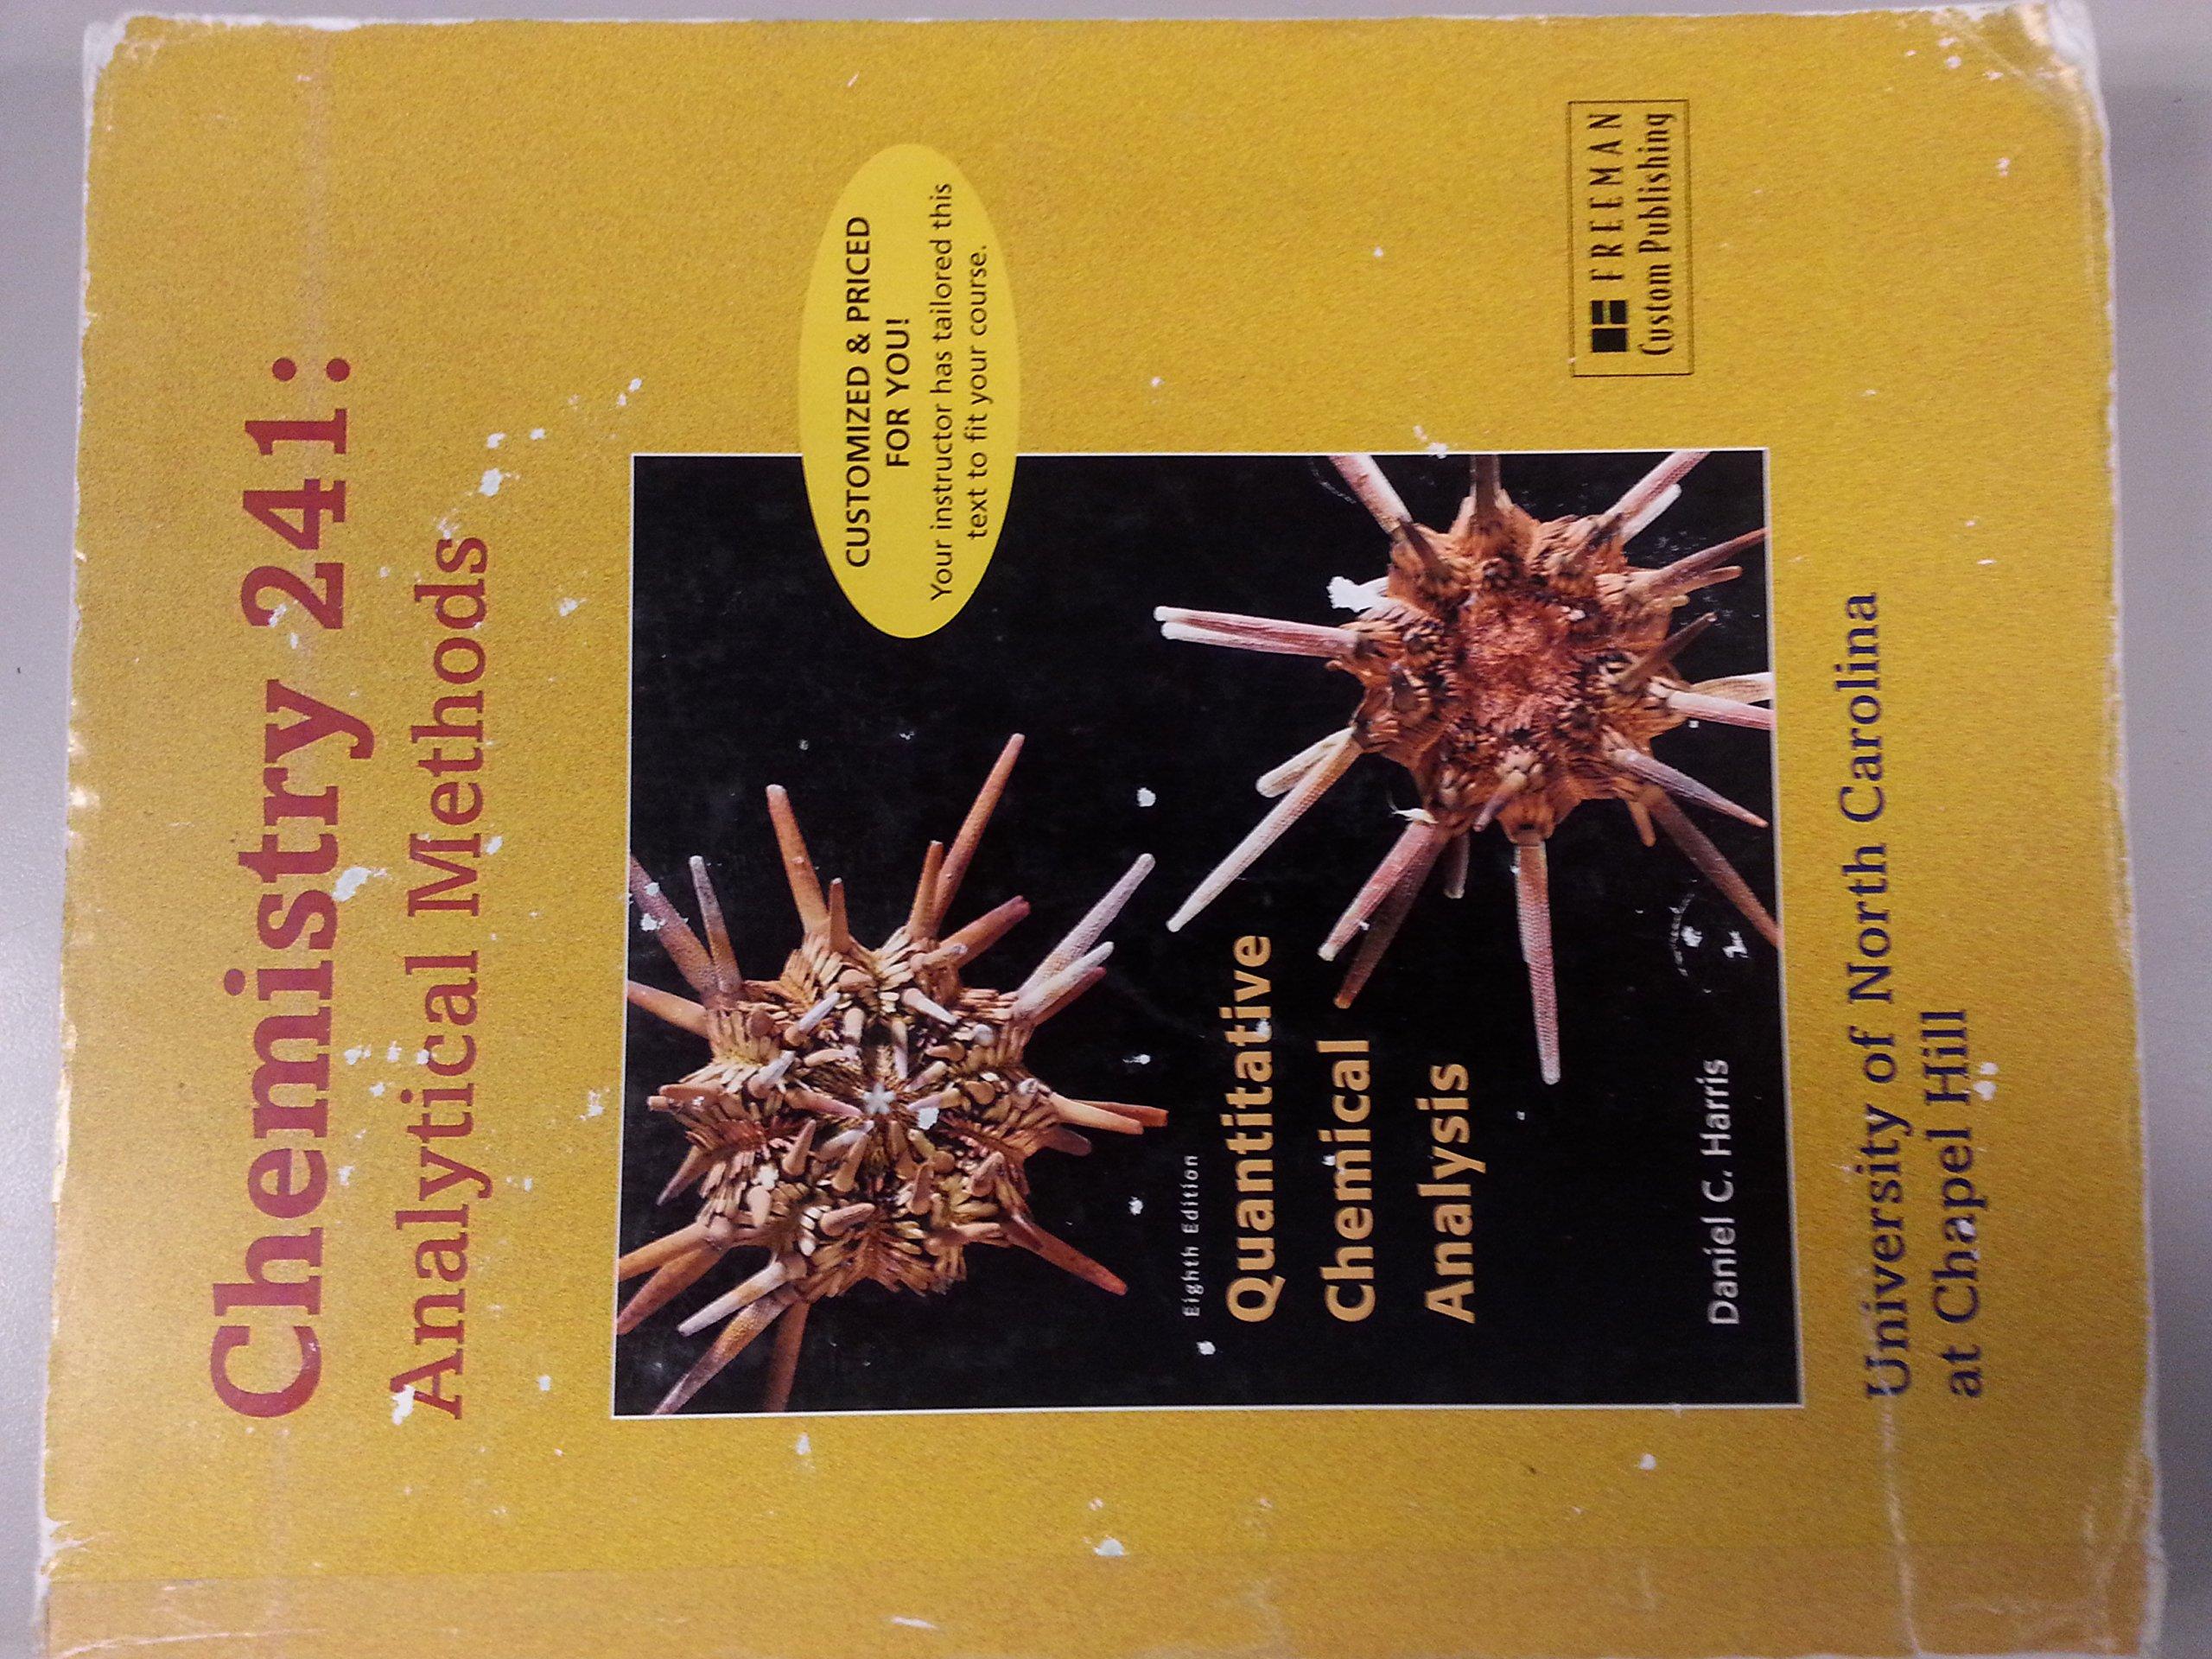 quantitative chemical analysis 8th edition daniel c harris free download